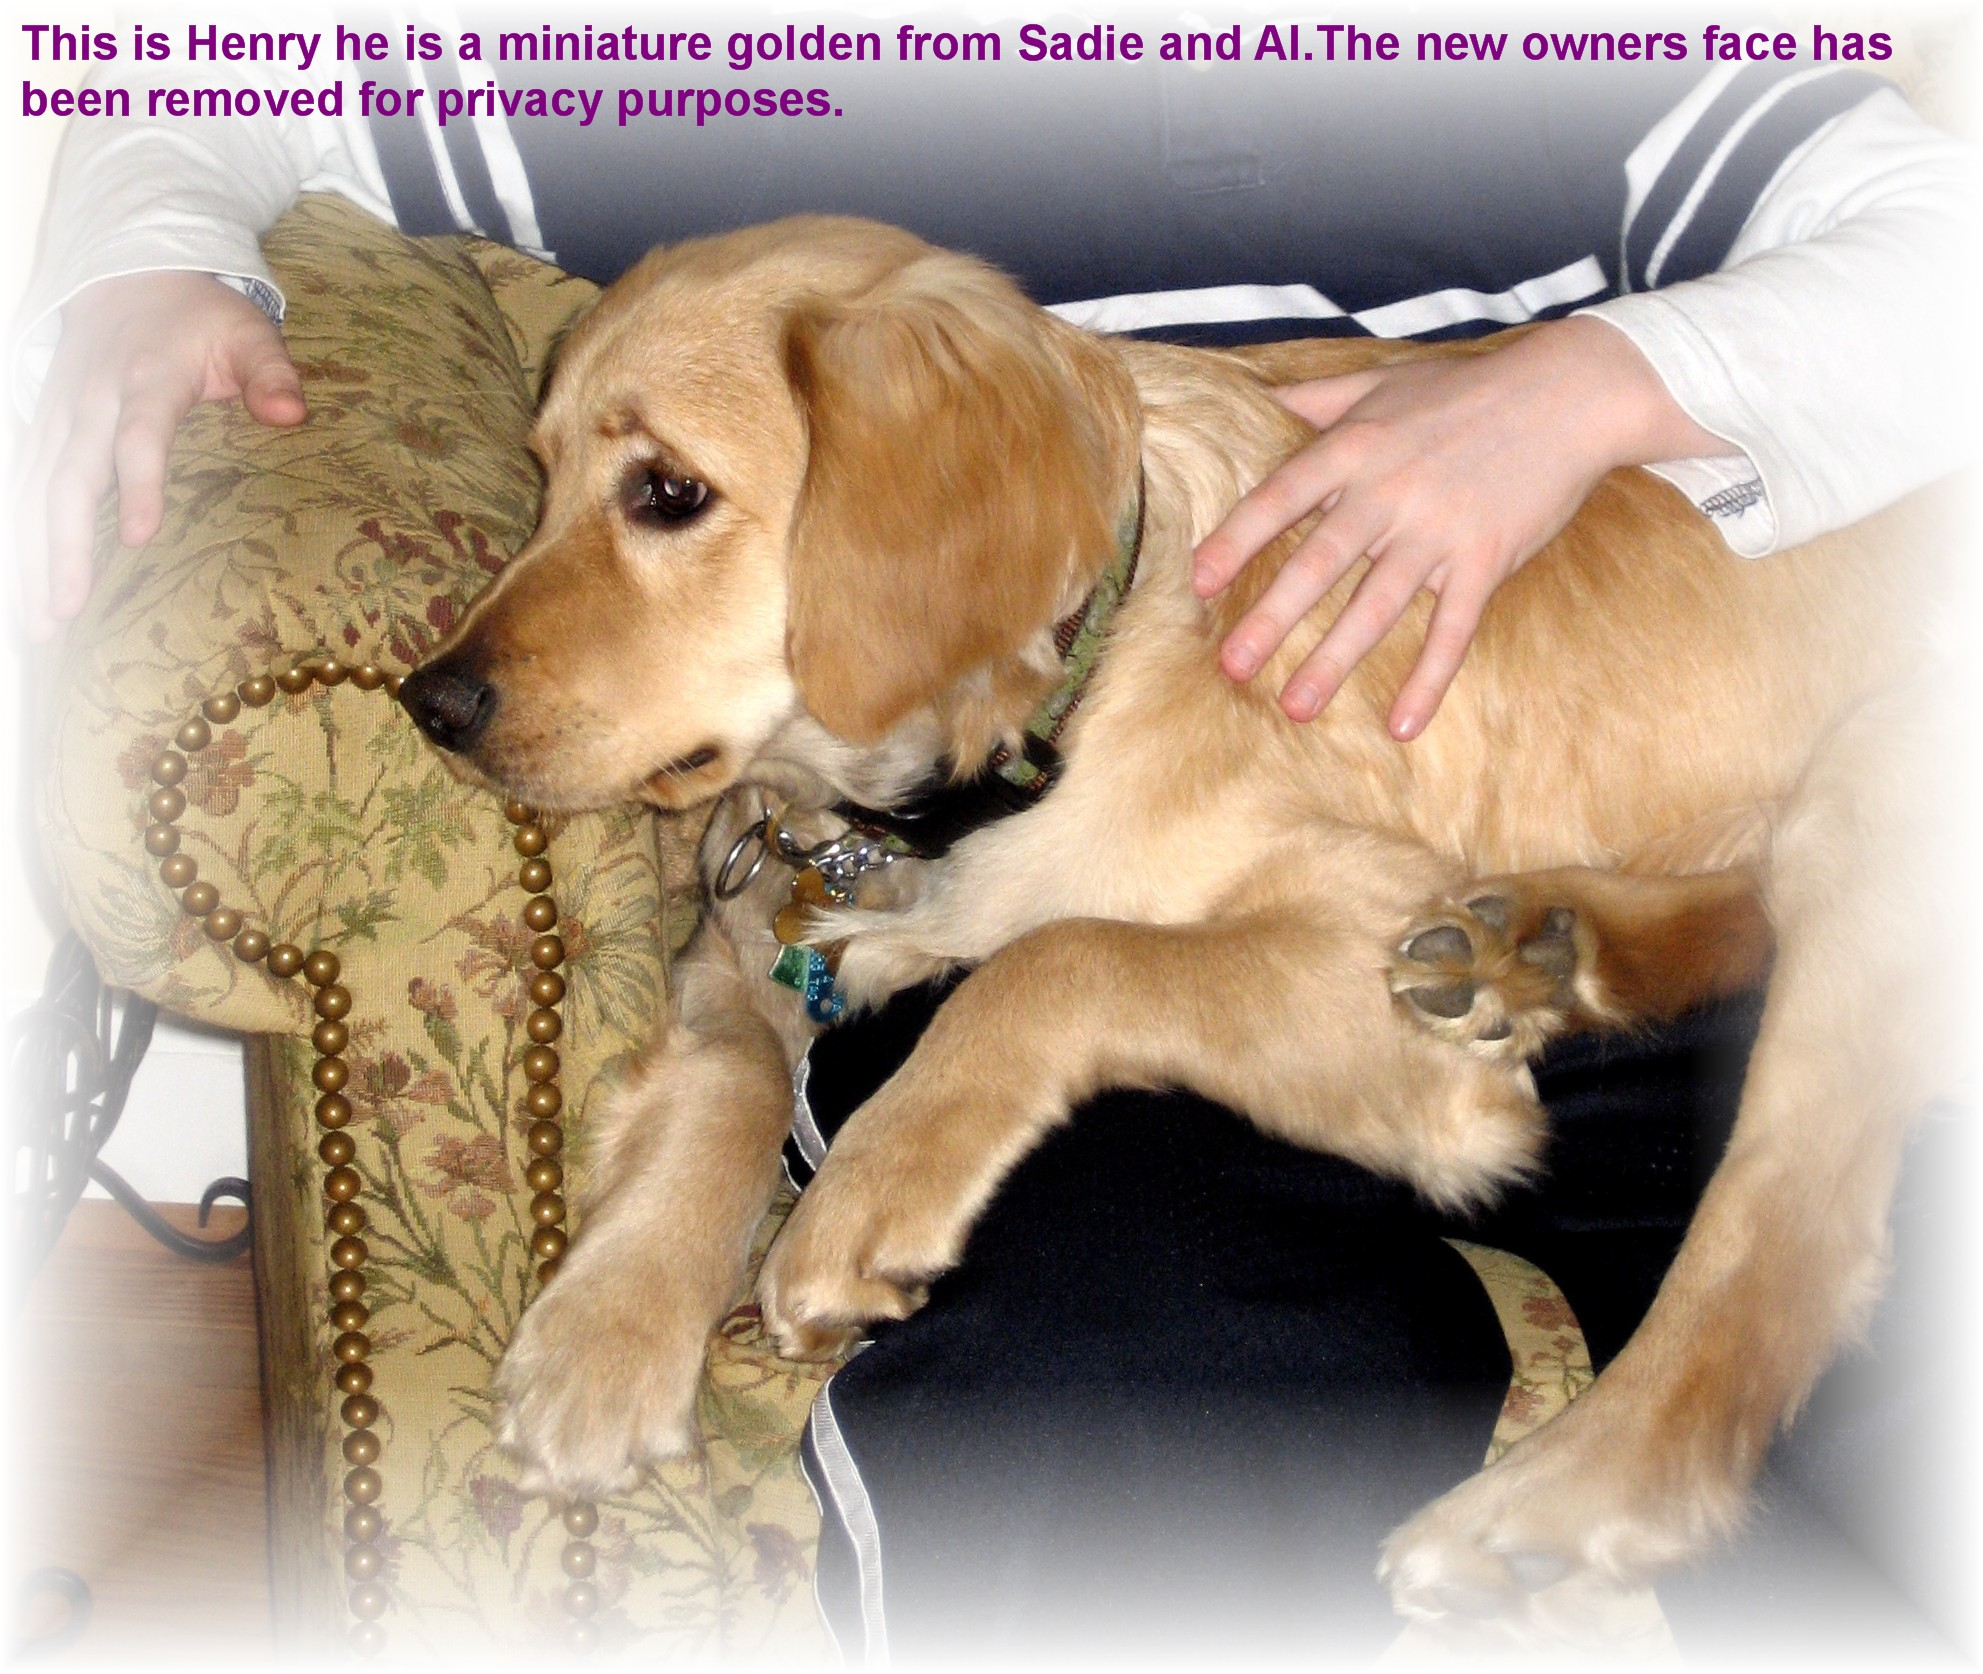 Miniature golden retriever puppies alabama